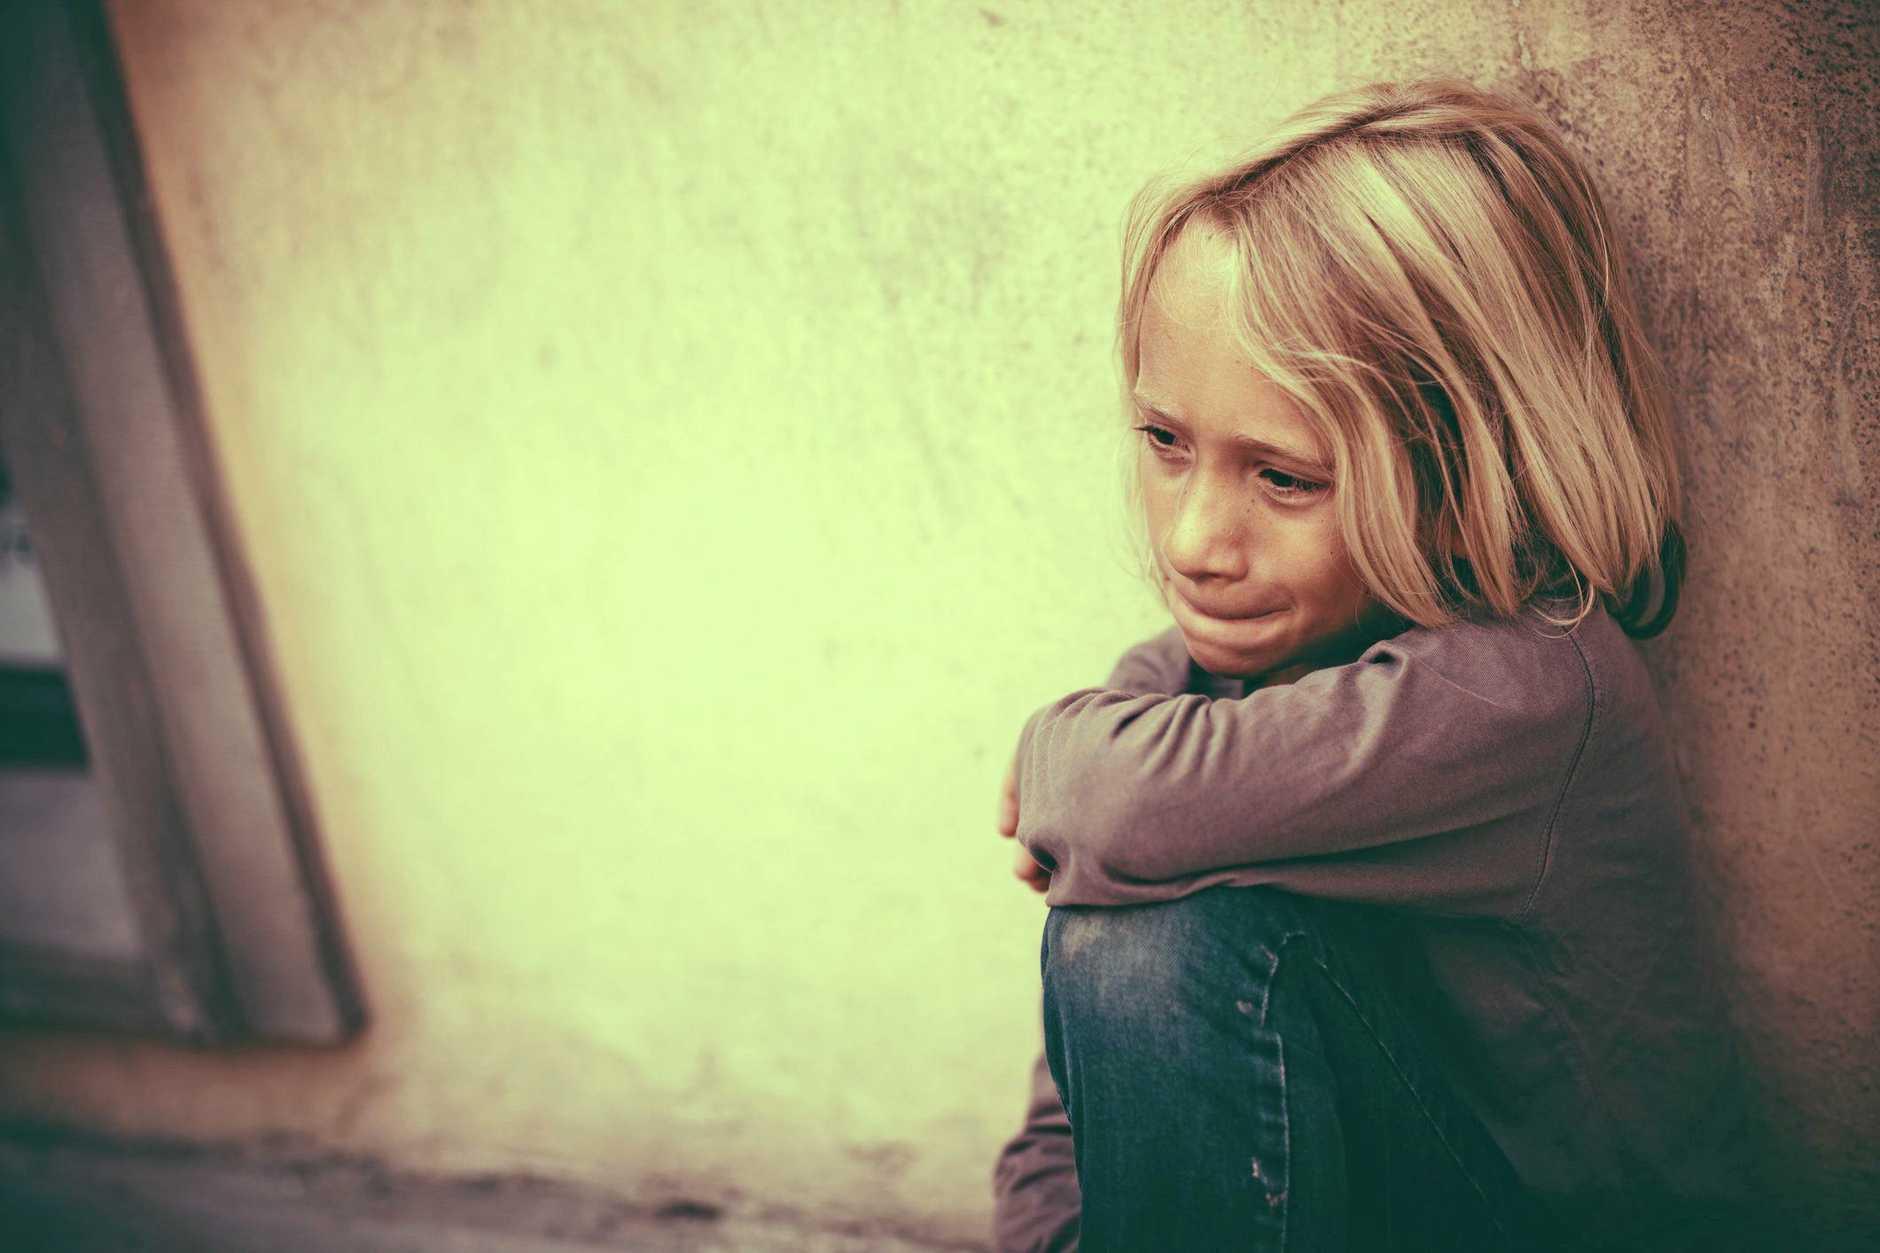 Australian parents owe children more than $1.5b in child support.